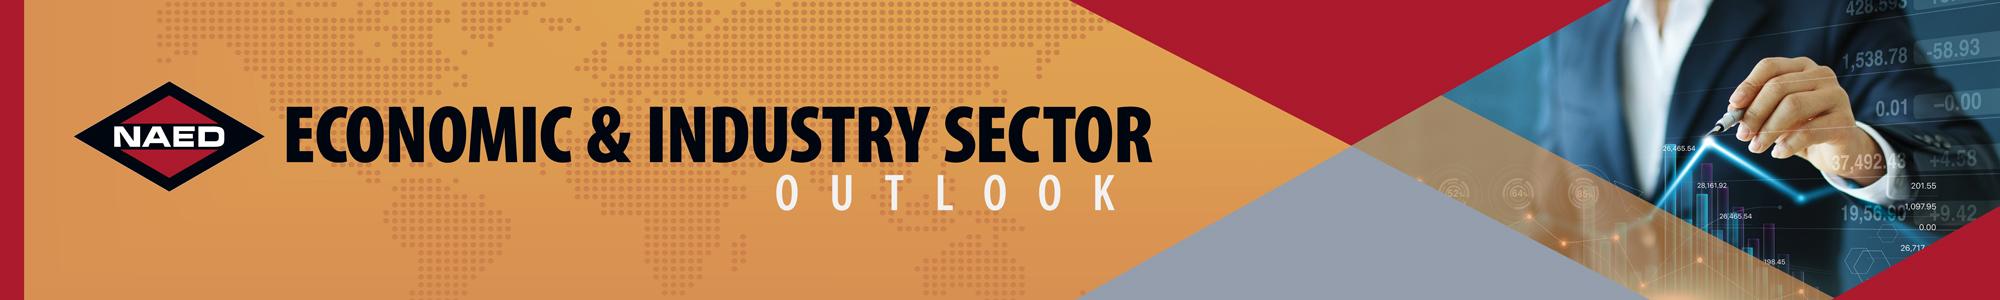 E&I-Sector-Outlook_Triangles_2000x300-web